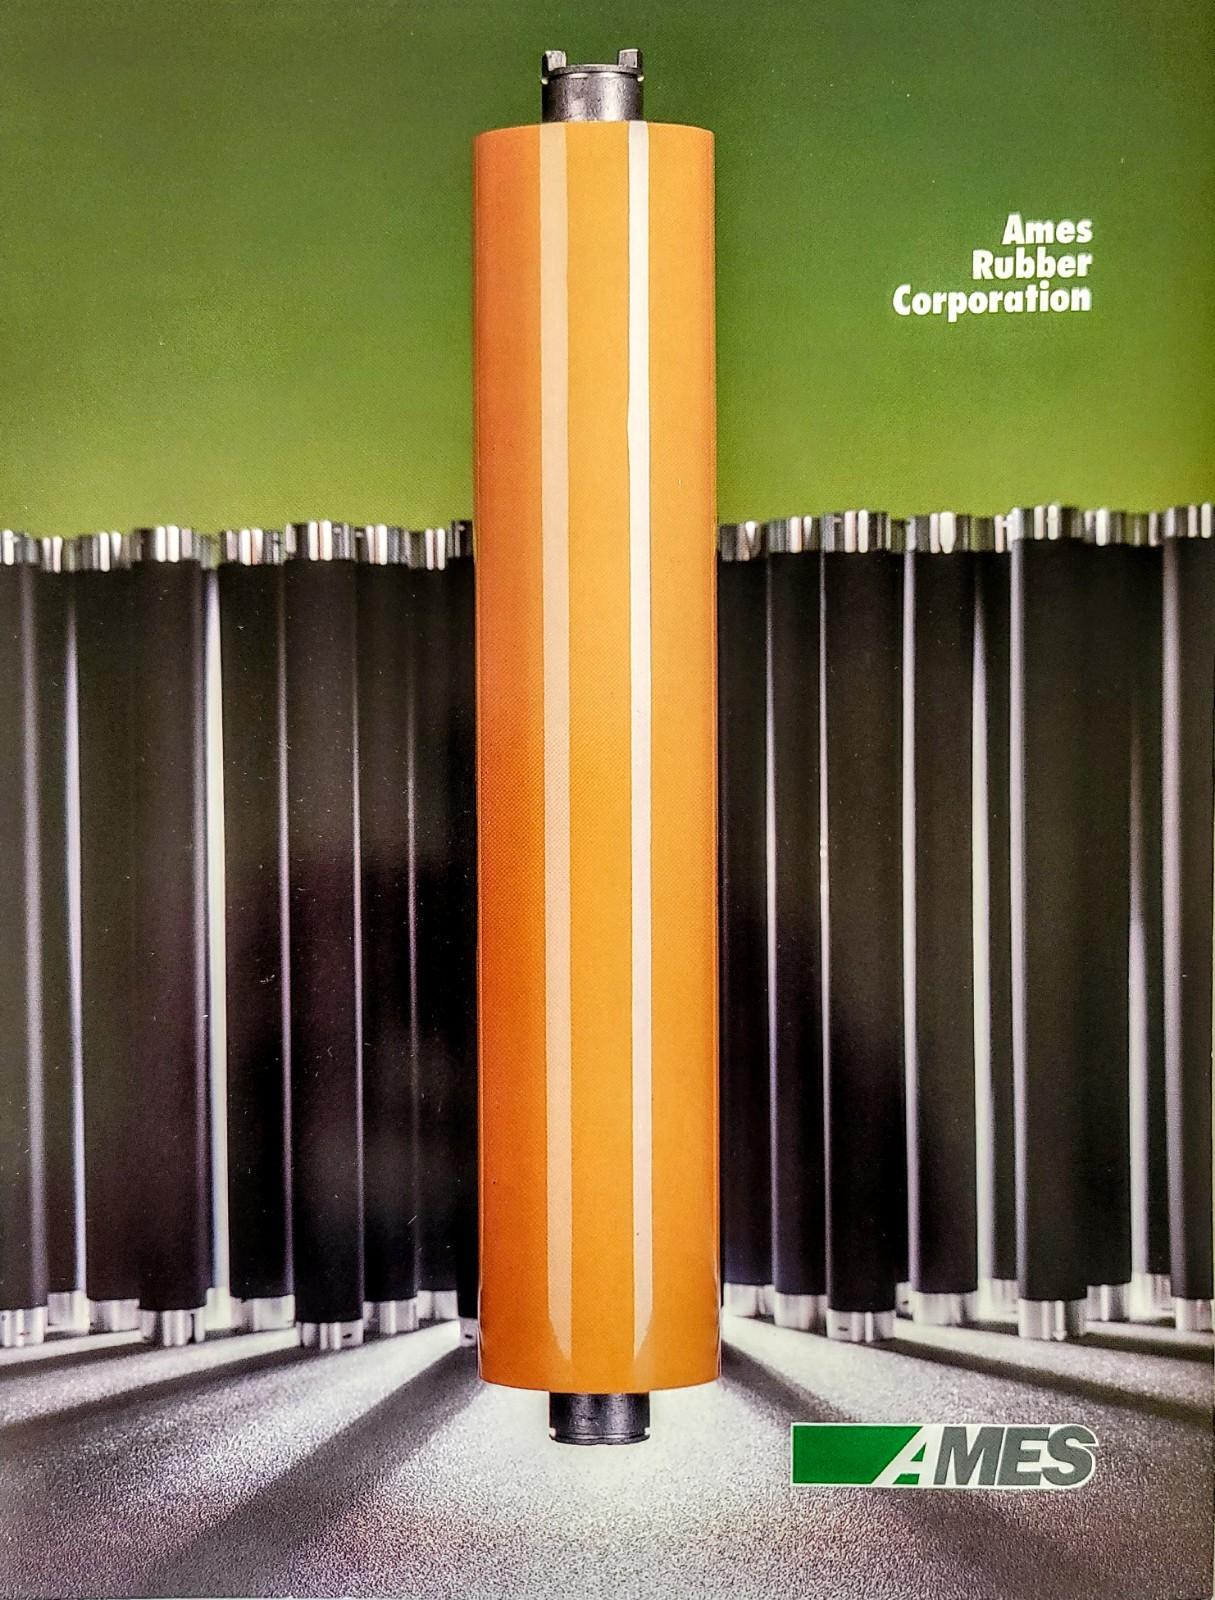 ames rubber_brochure_6